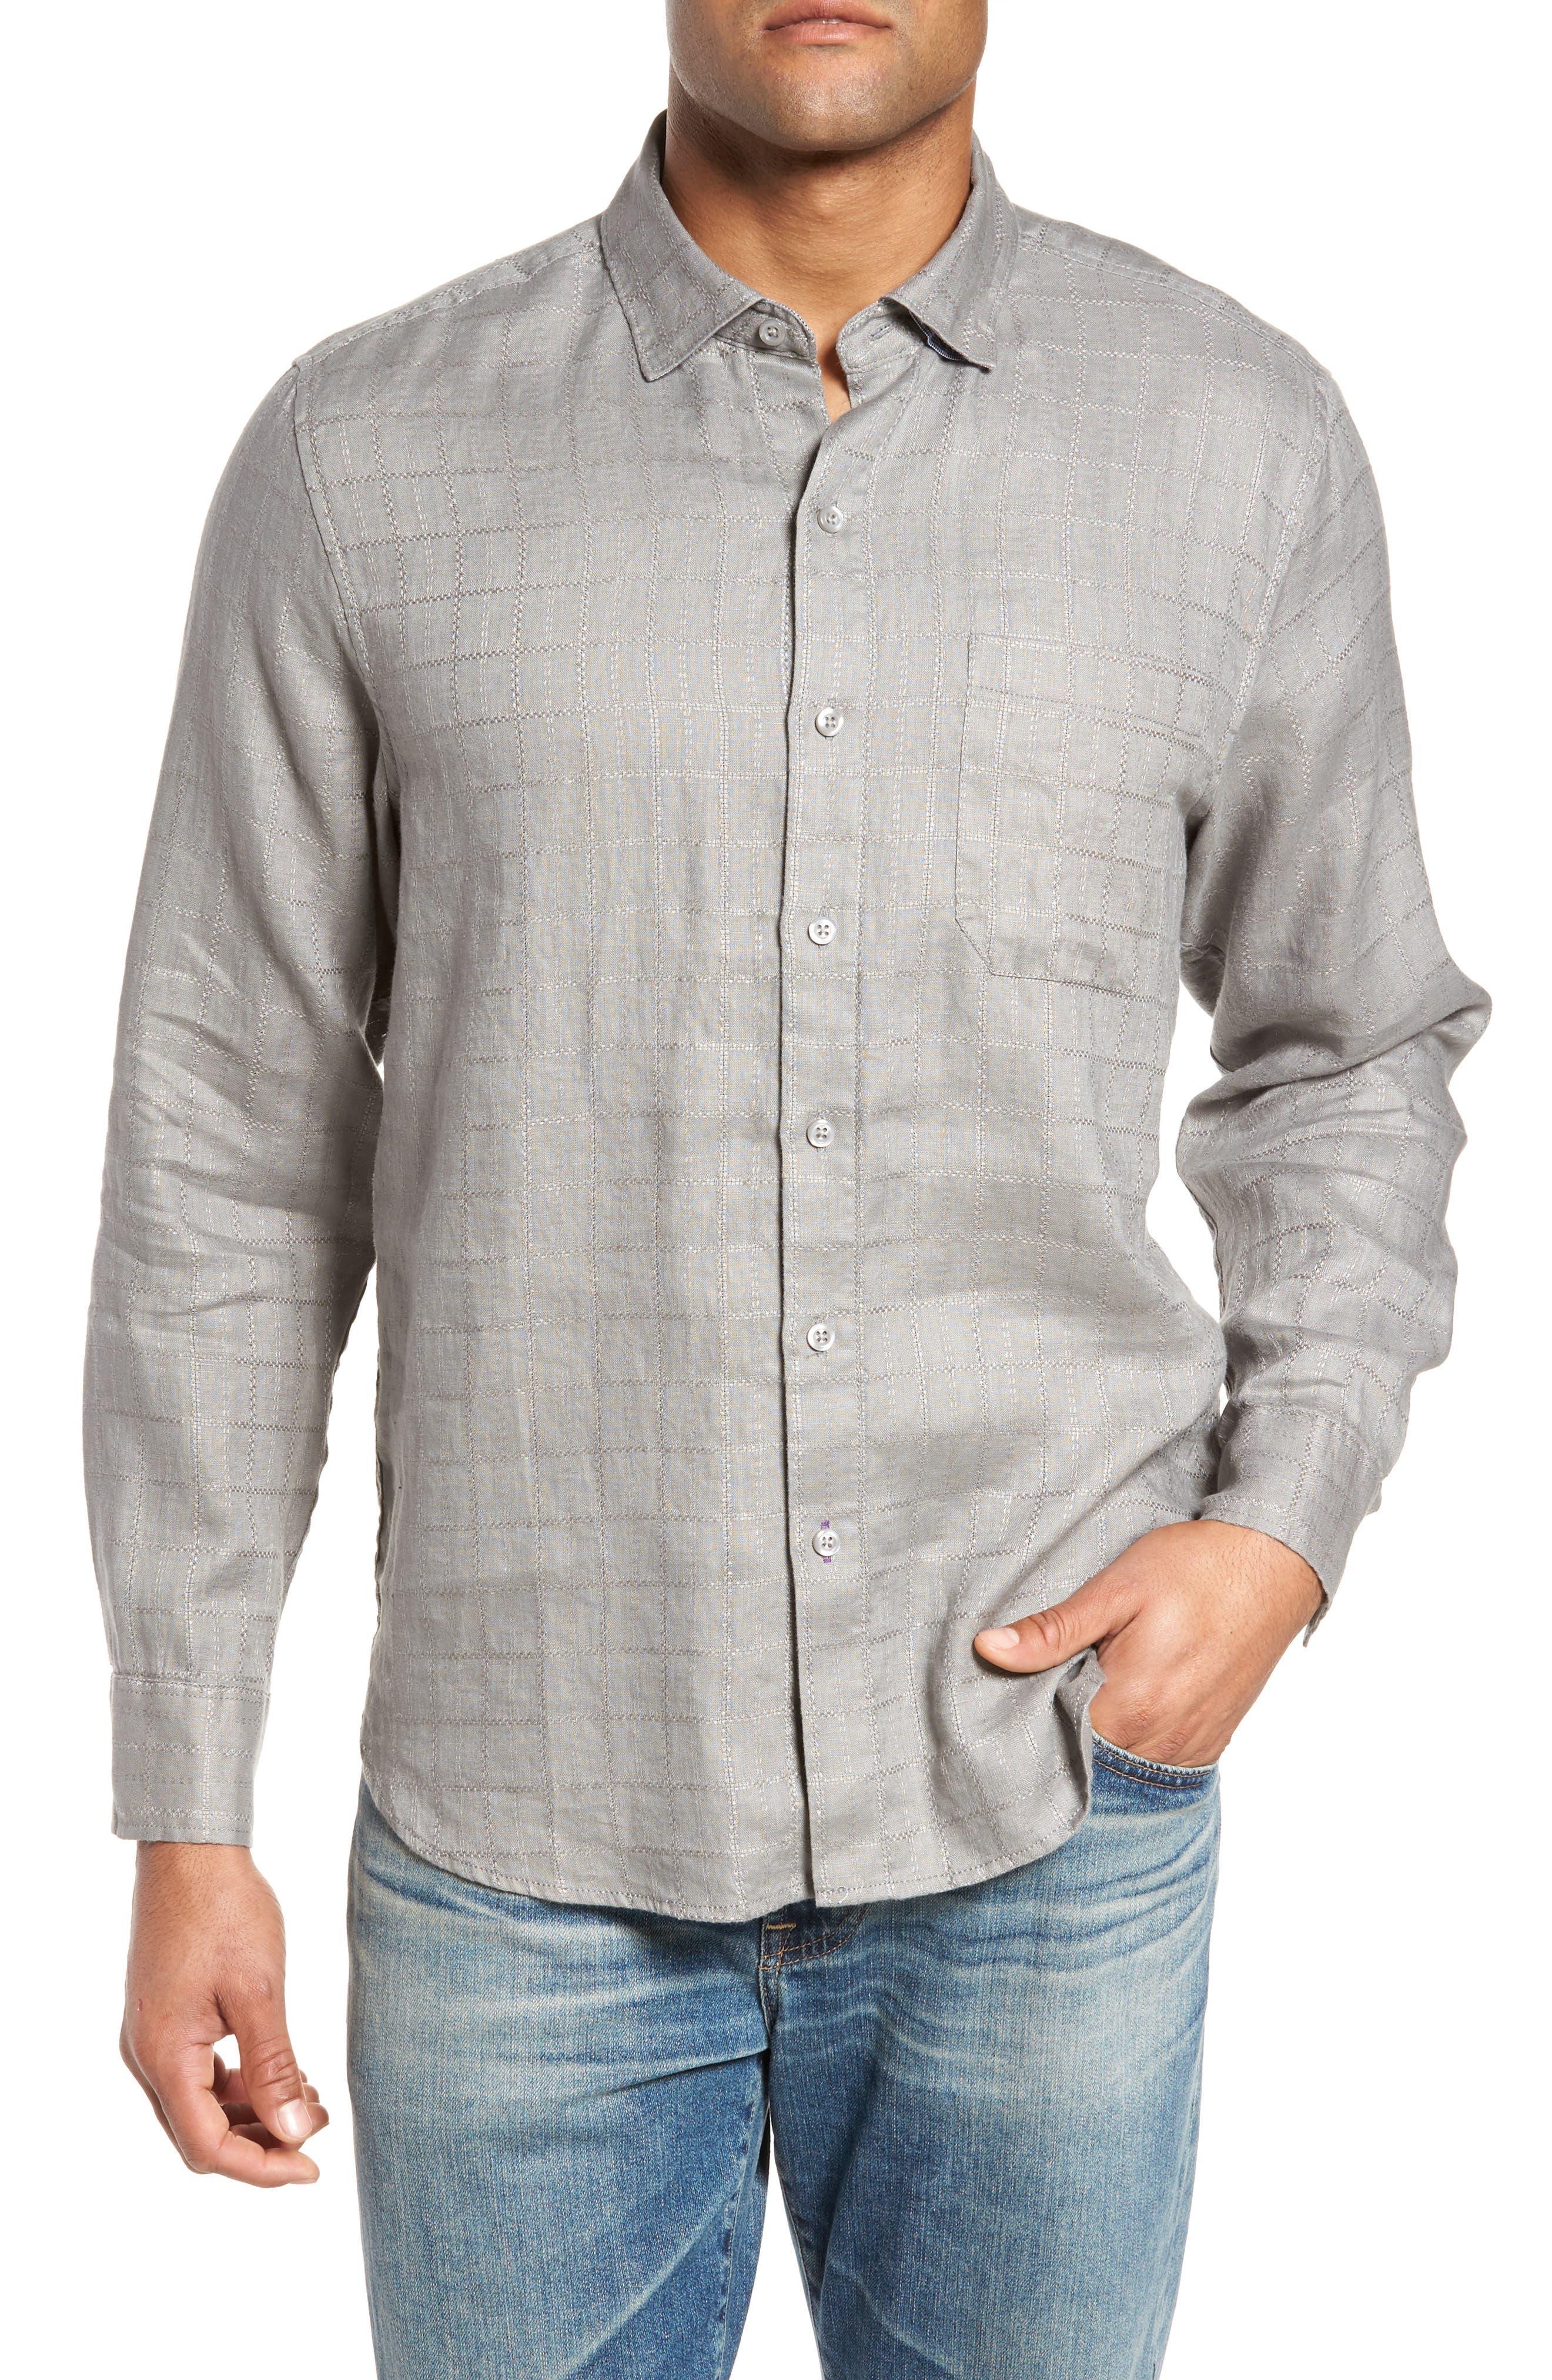 Costa Cera Linen Sport Shirt,                         Main,                         color, 050